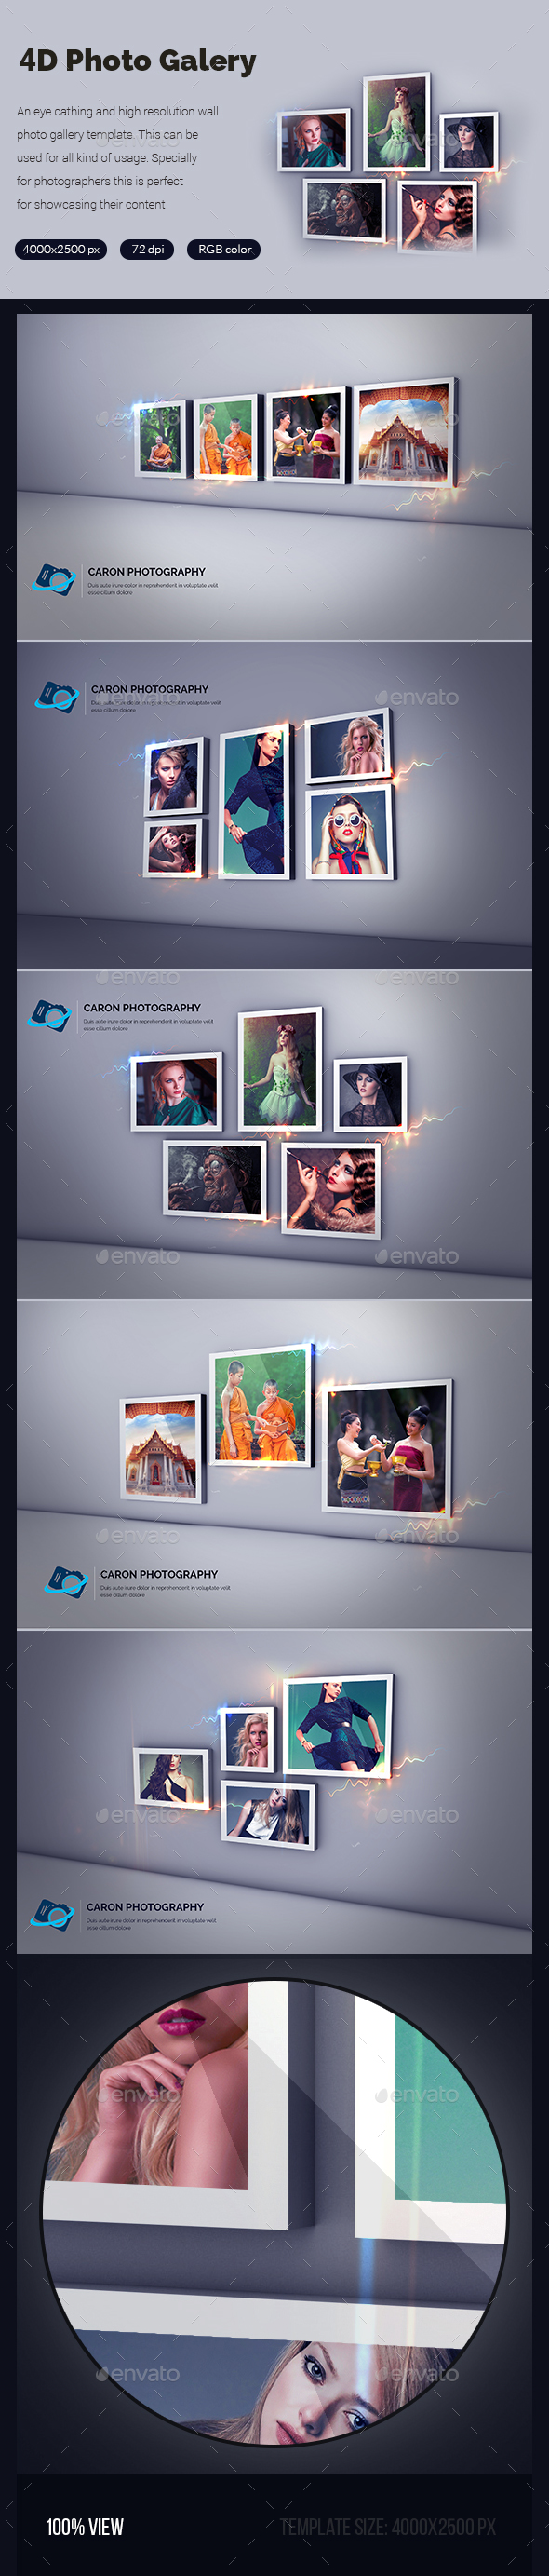 4D Photo Gallery Template - Urban Photo Templates